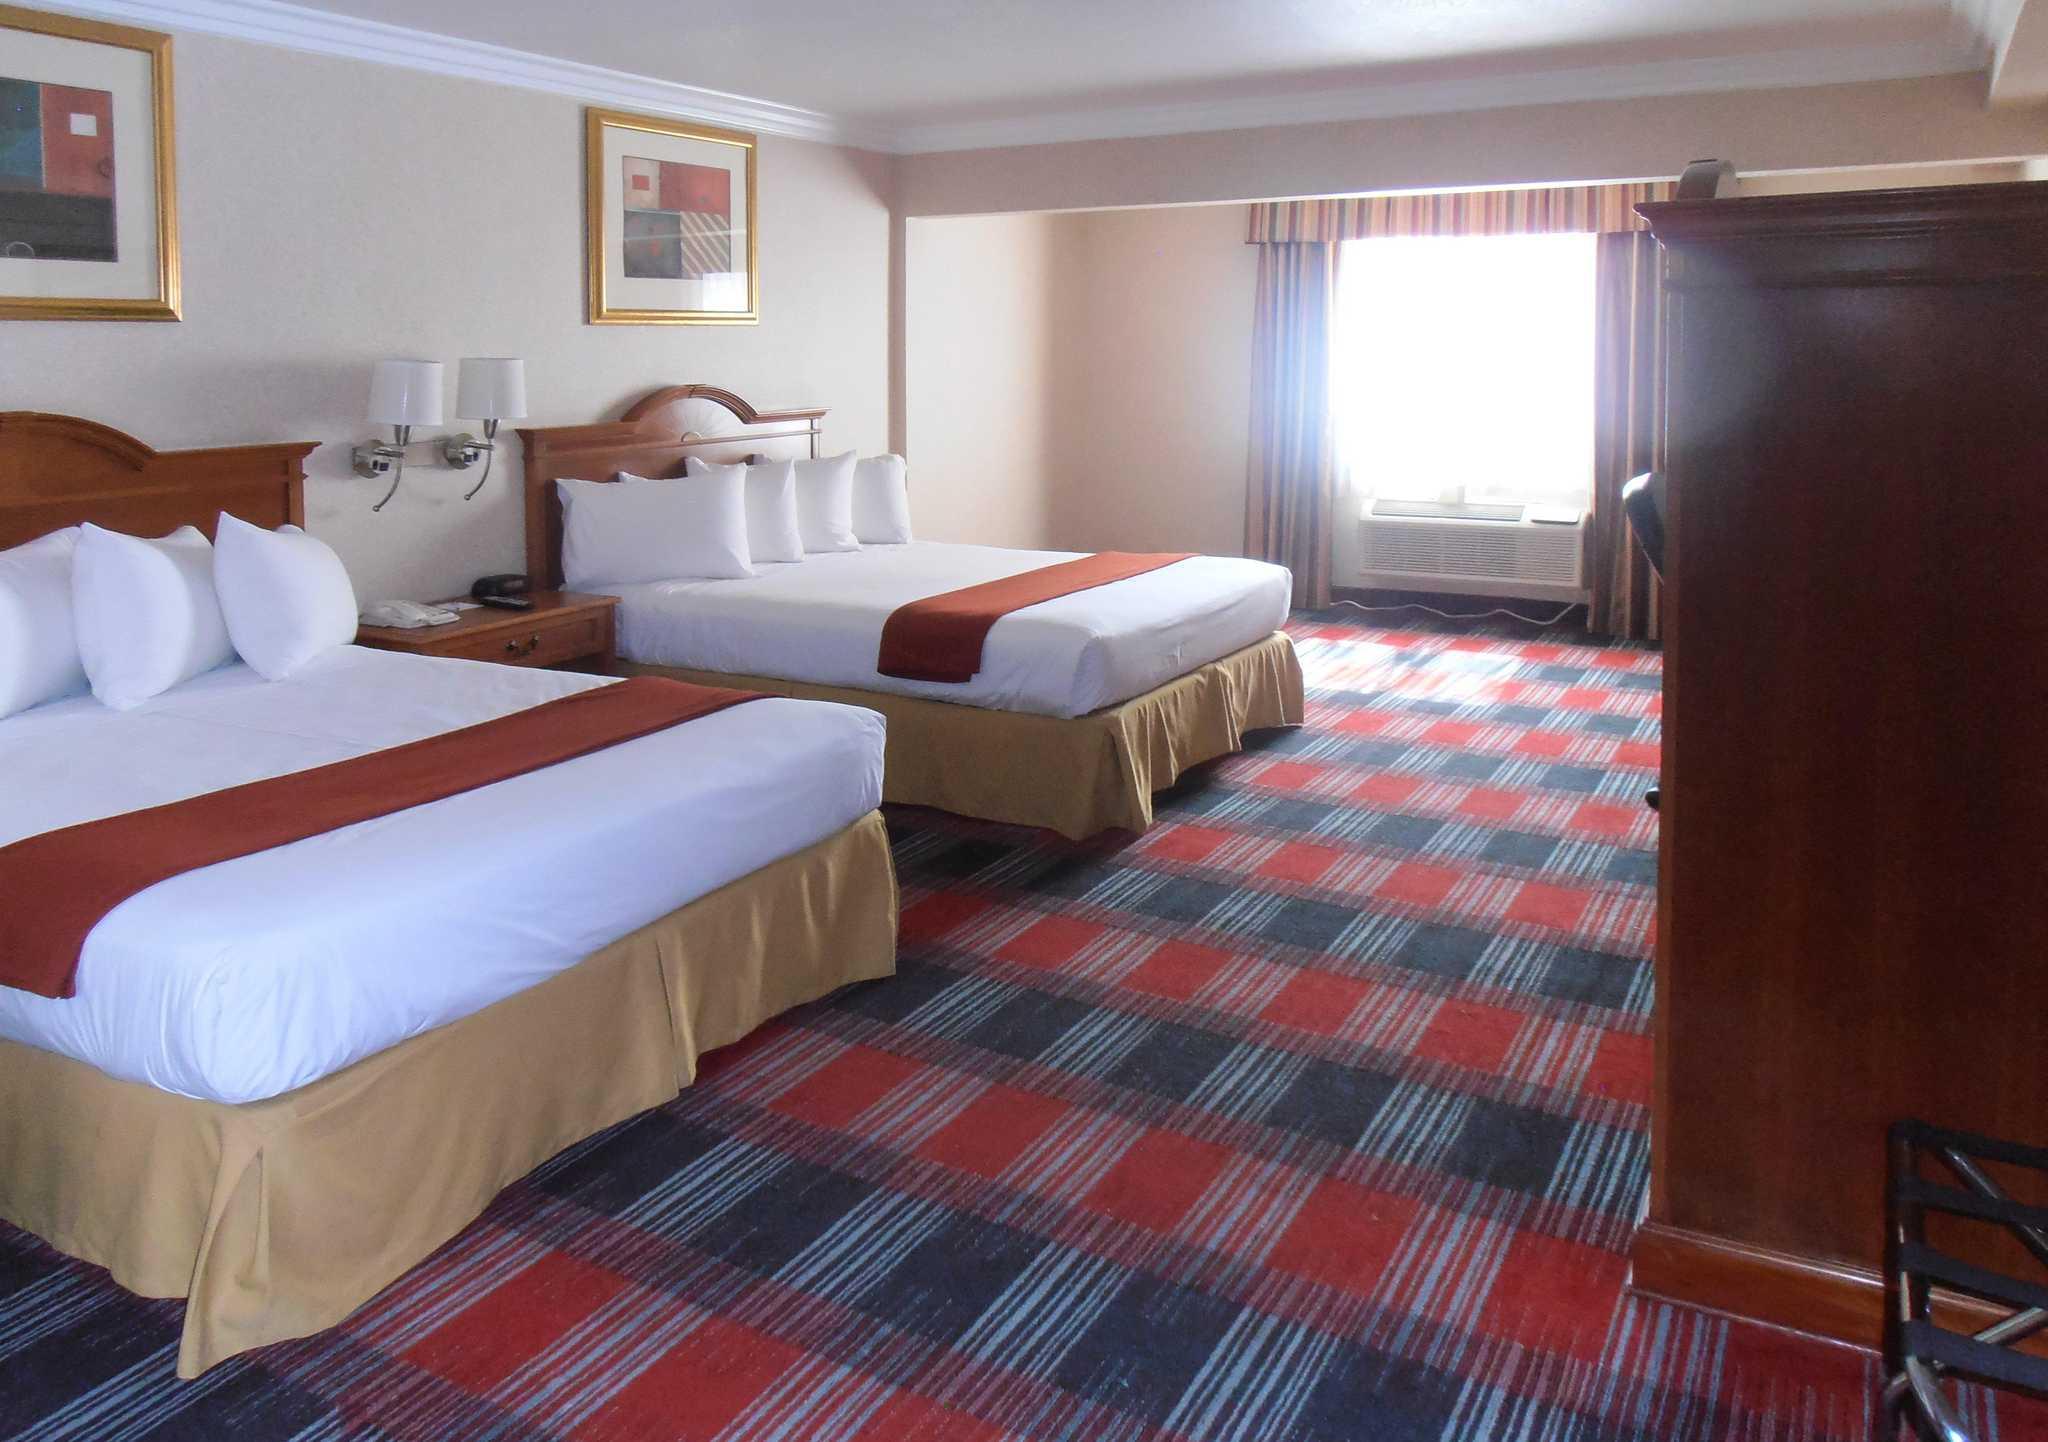 Quality Inn & Suites Oceanside Near Camp Pendleton image 2